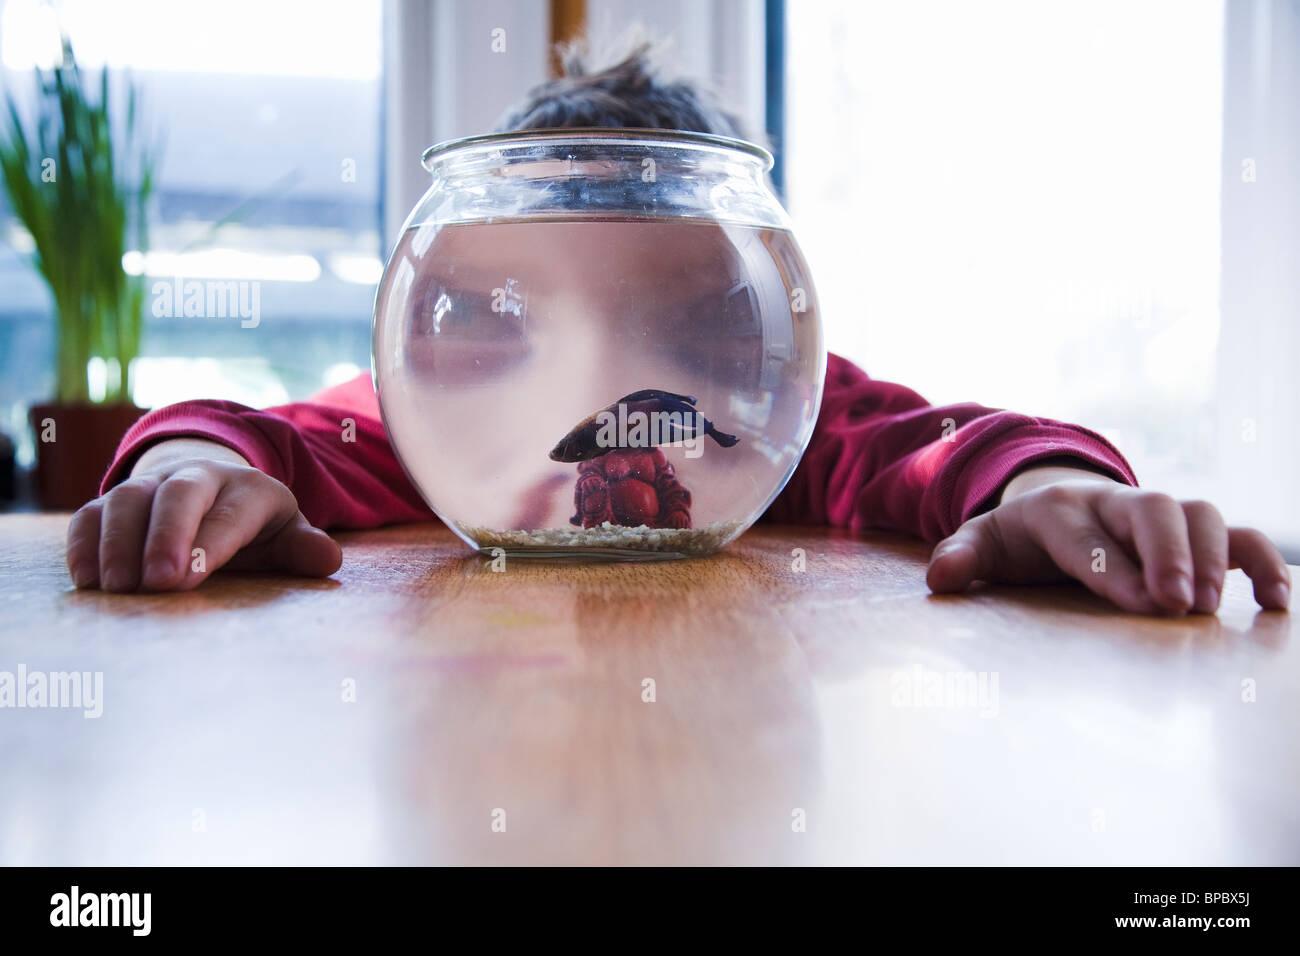 Fish tank toilet - Boy Watching His Pet Betta Fish In A Fish Tank Fishbowl Stock Image